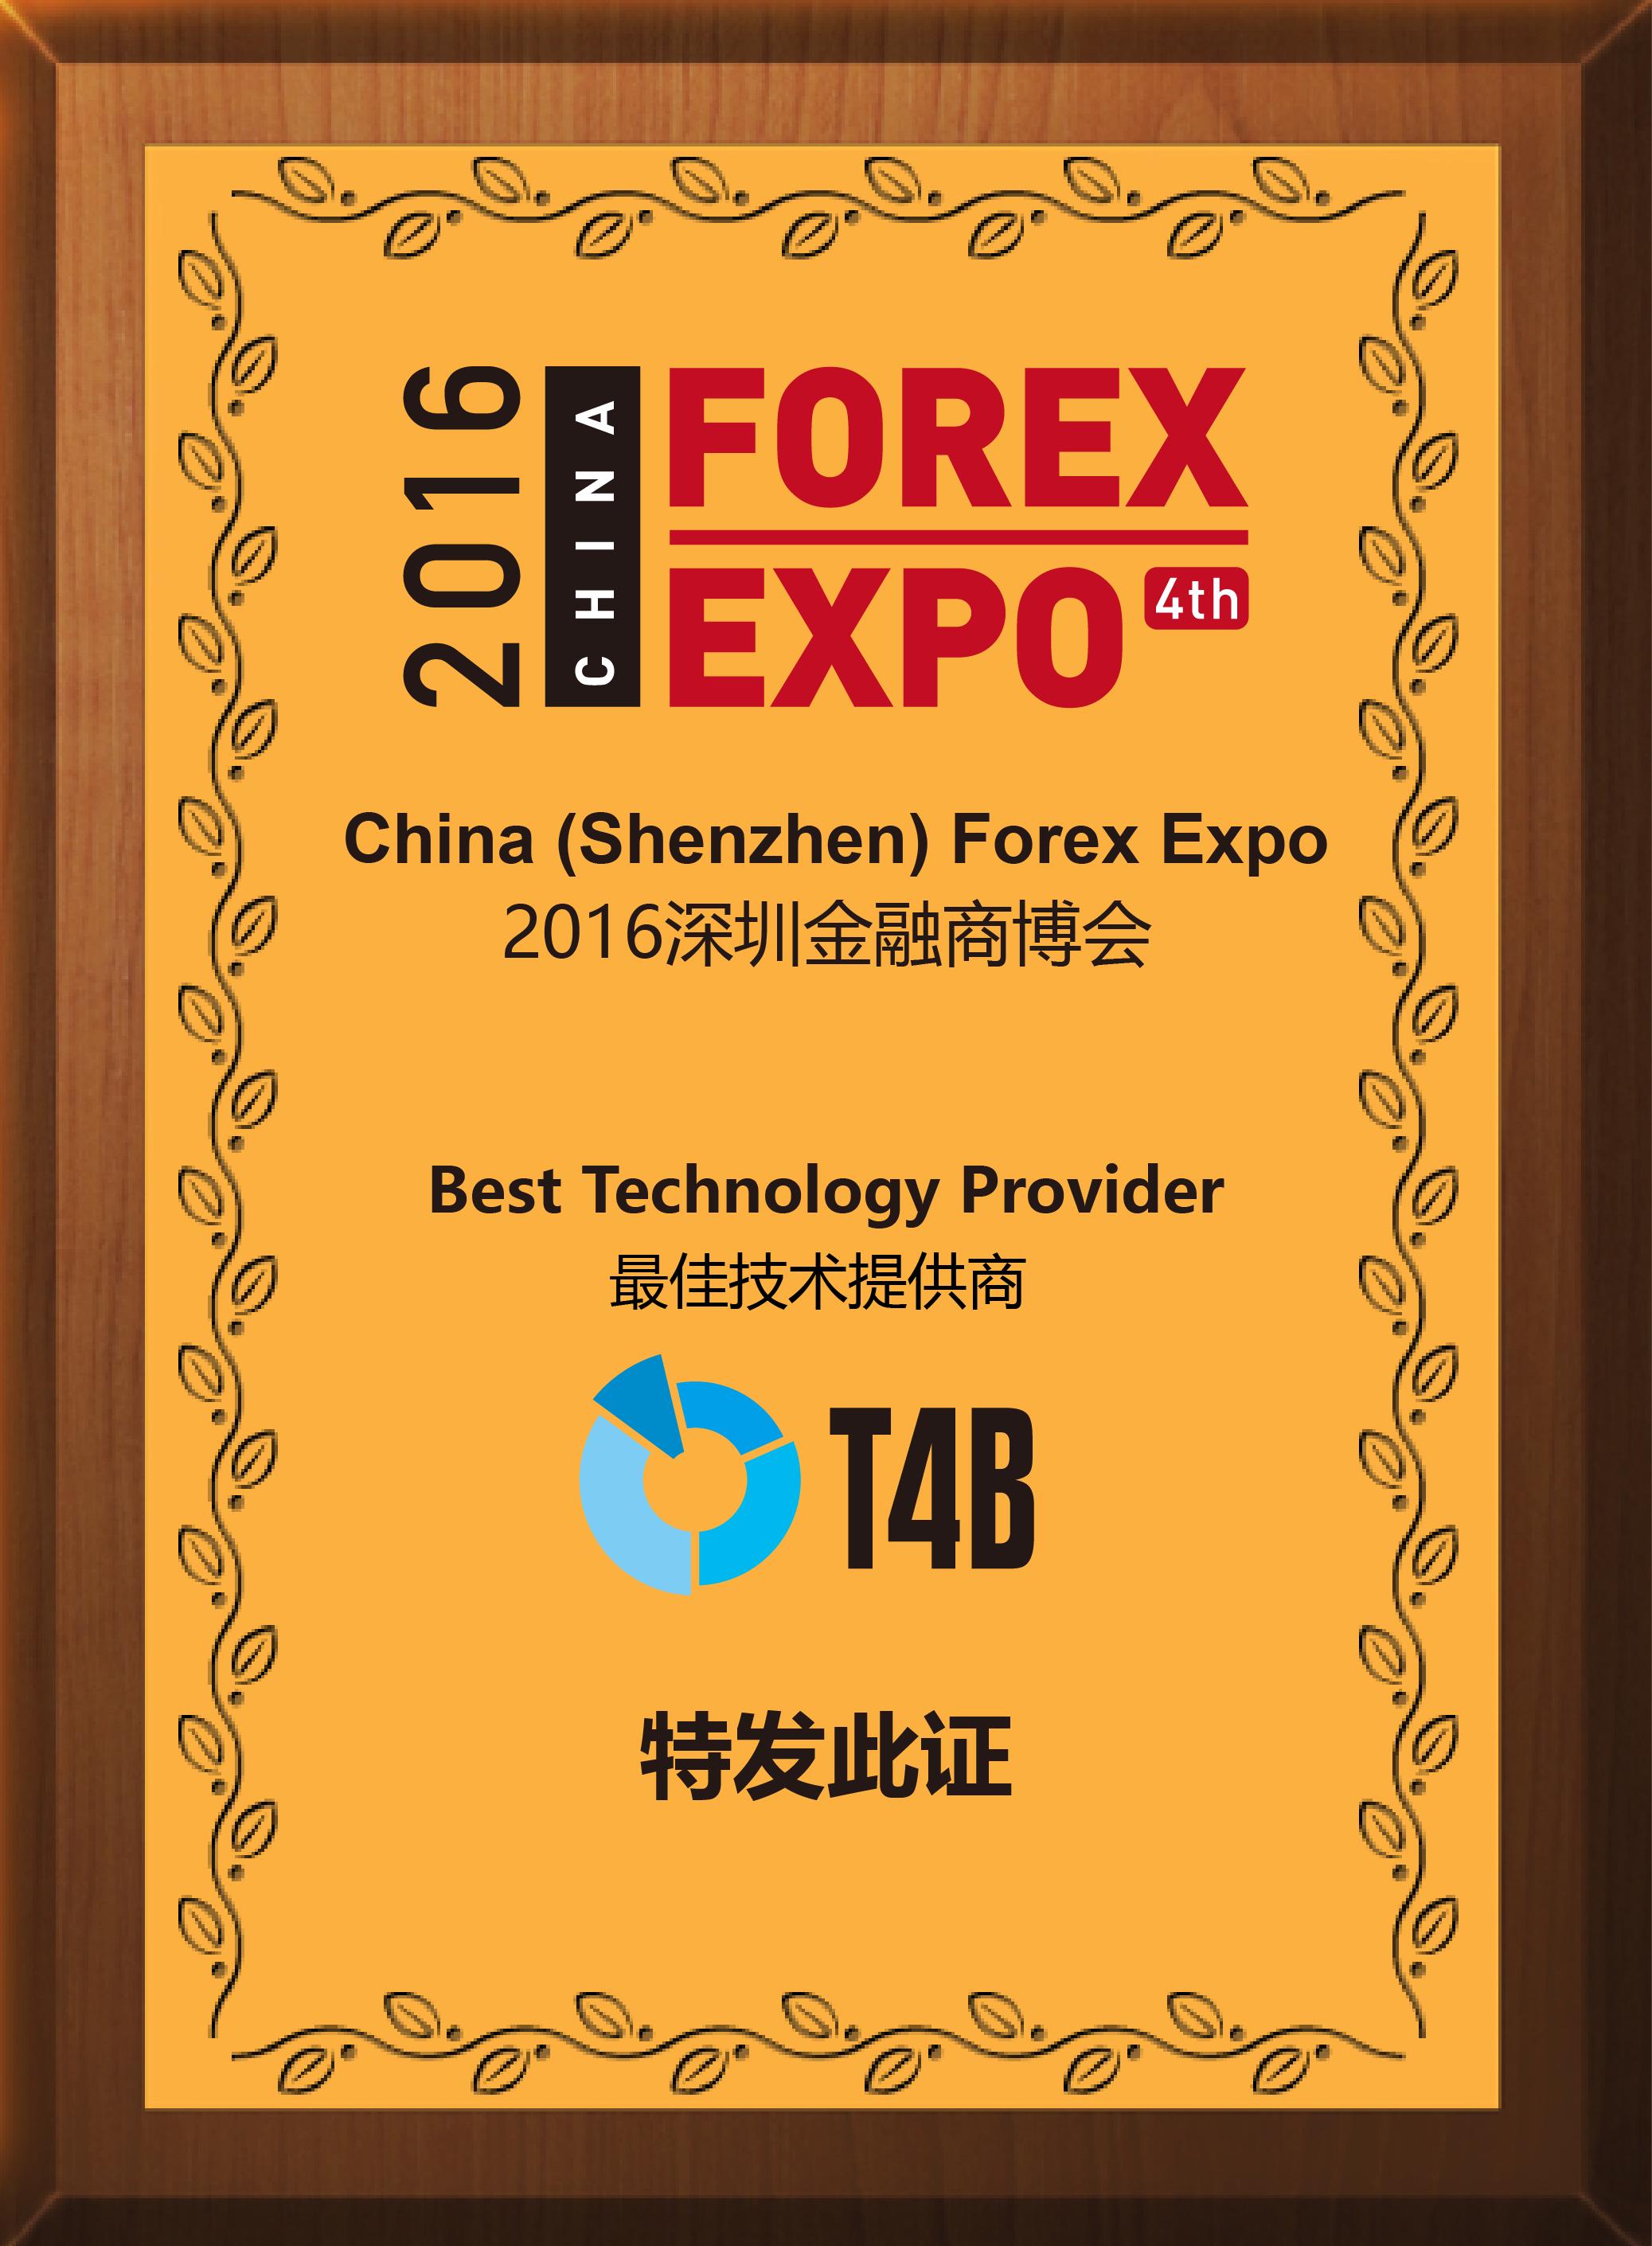 Forex expo awards